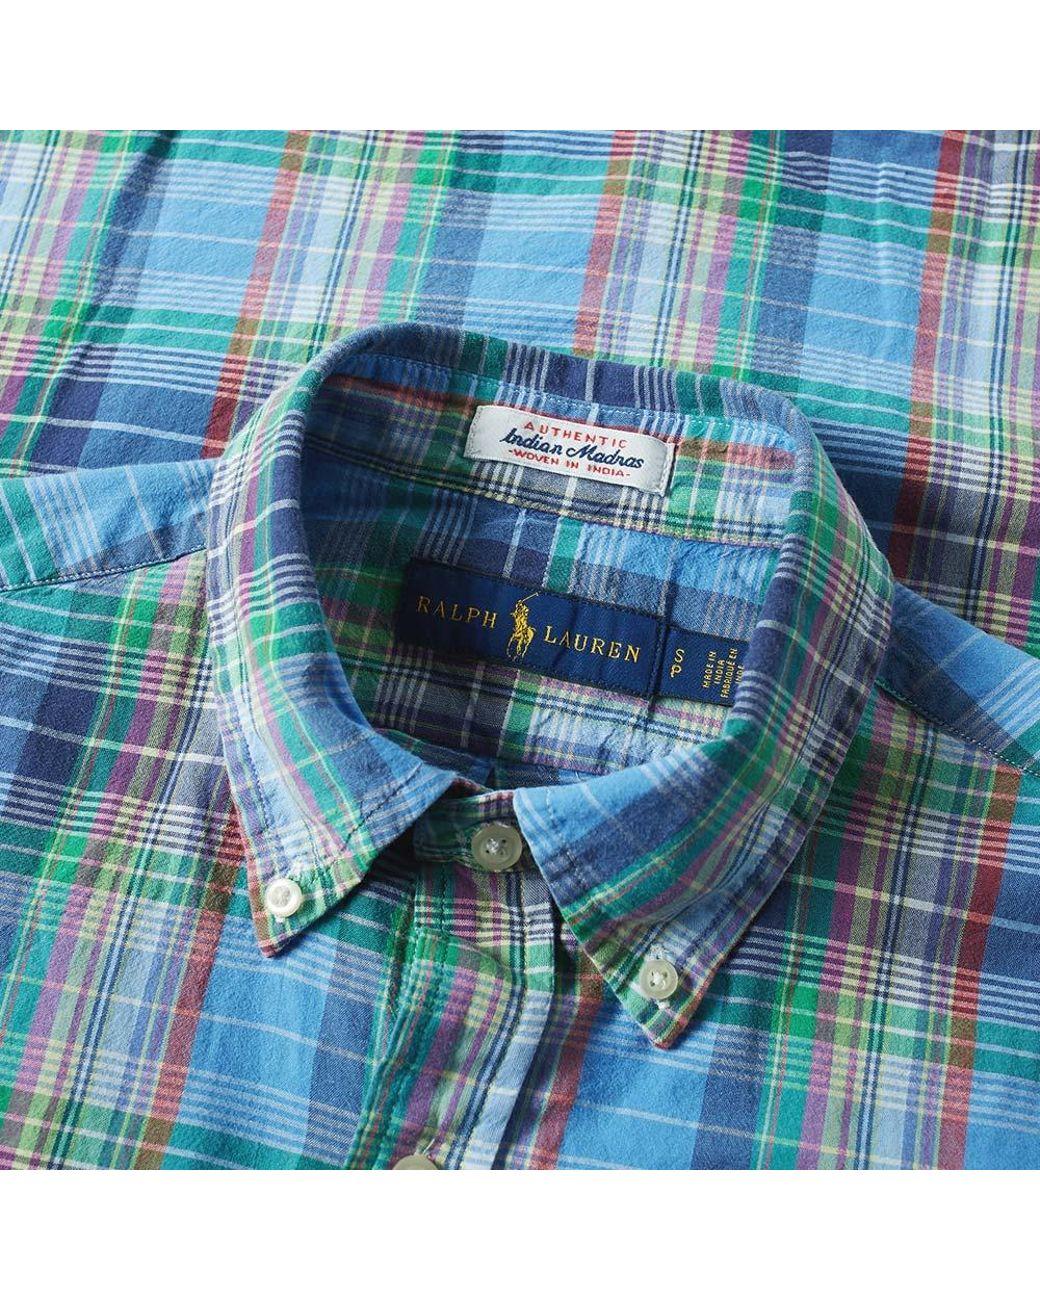 SEXTDSFD Check Fabric Mens Running Casual Short Beach Pants Swim Trunks Drawstring Board Shorts Swimwear